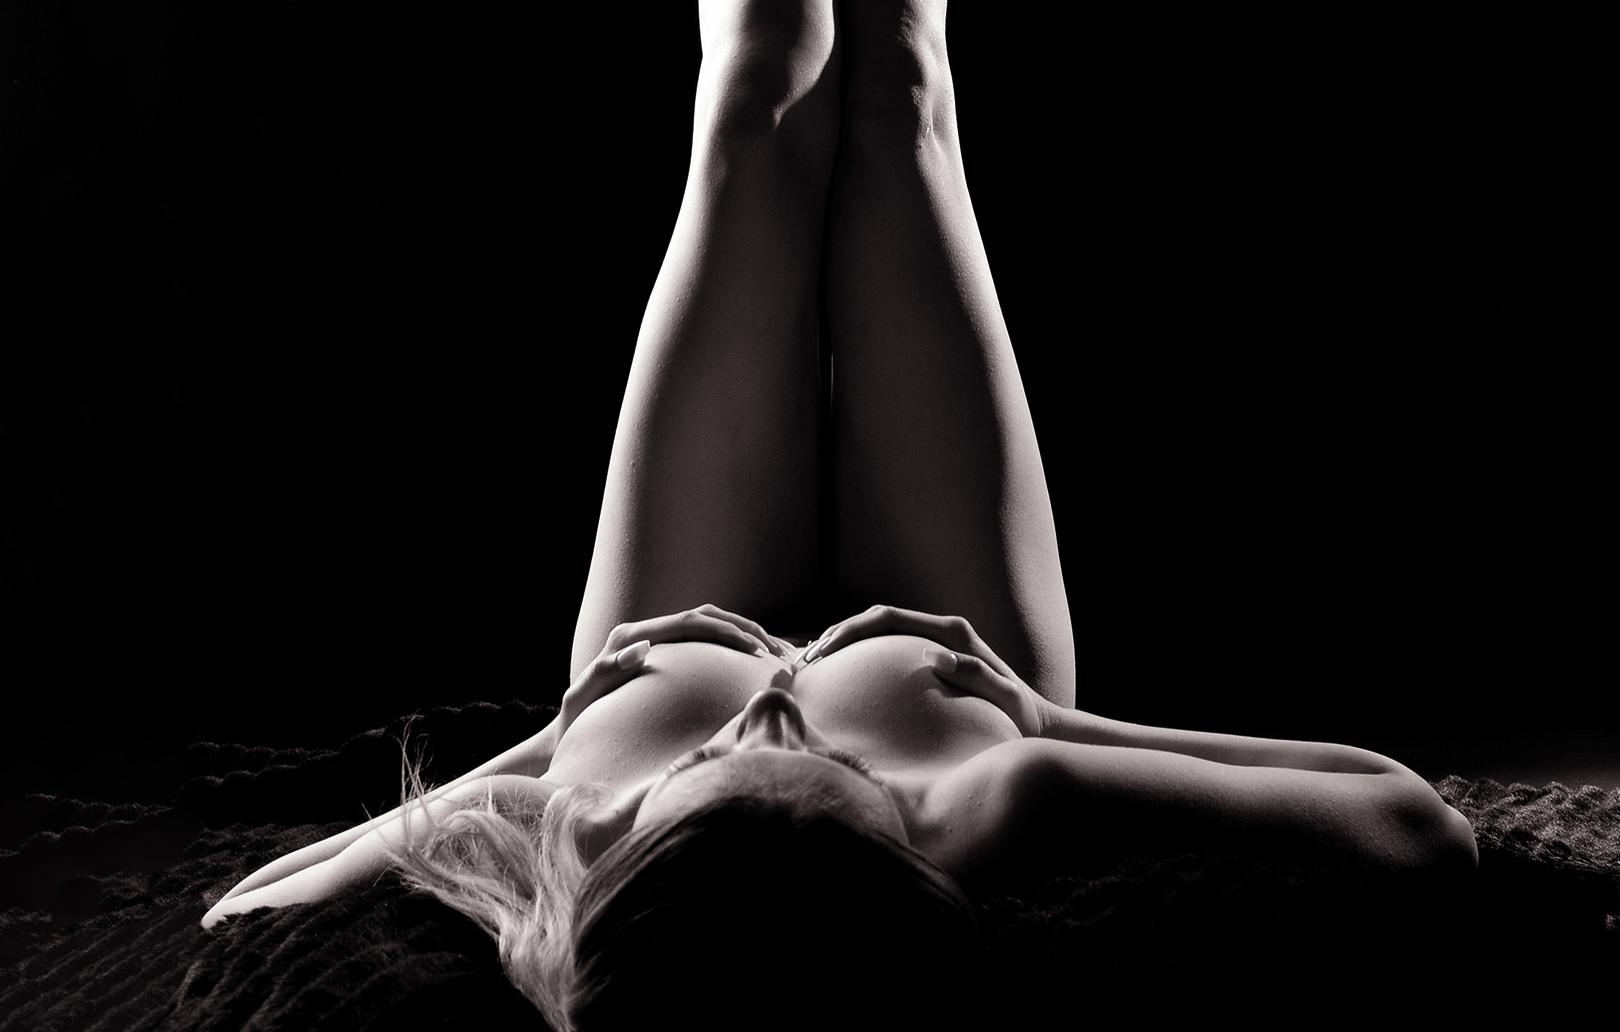 erotisches-fotoshooting-hagen-bg21610451715